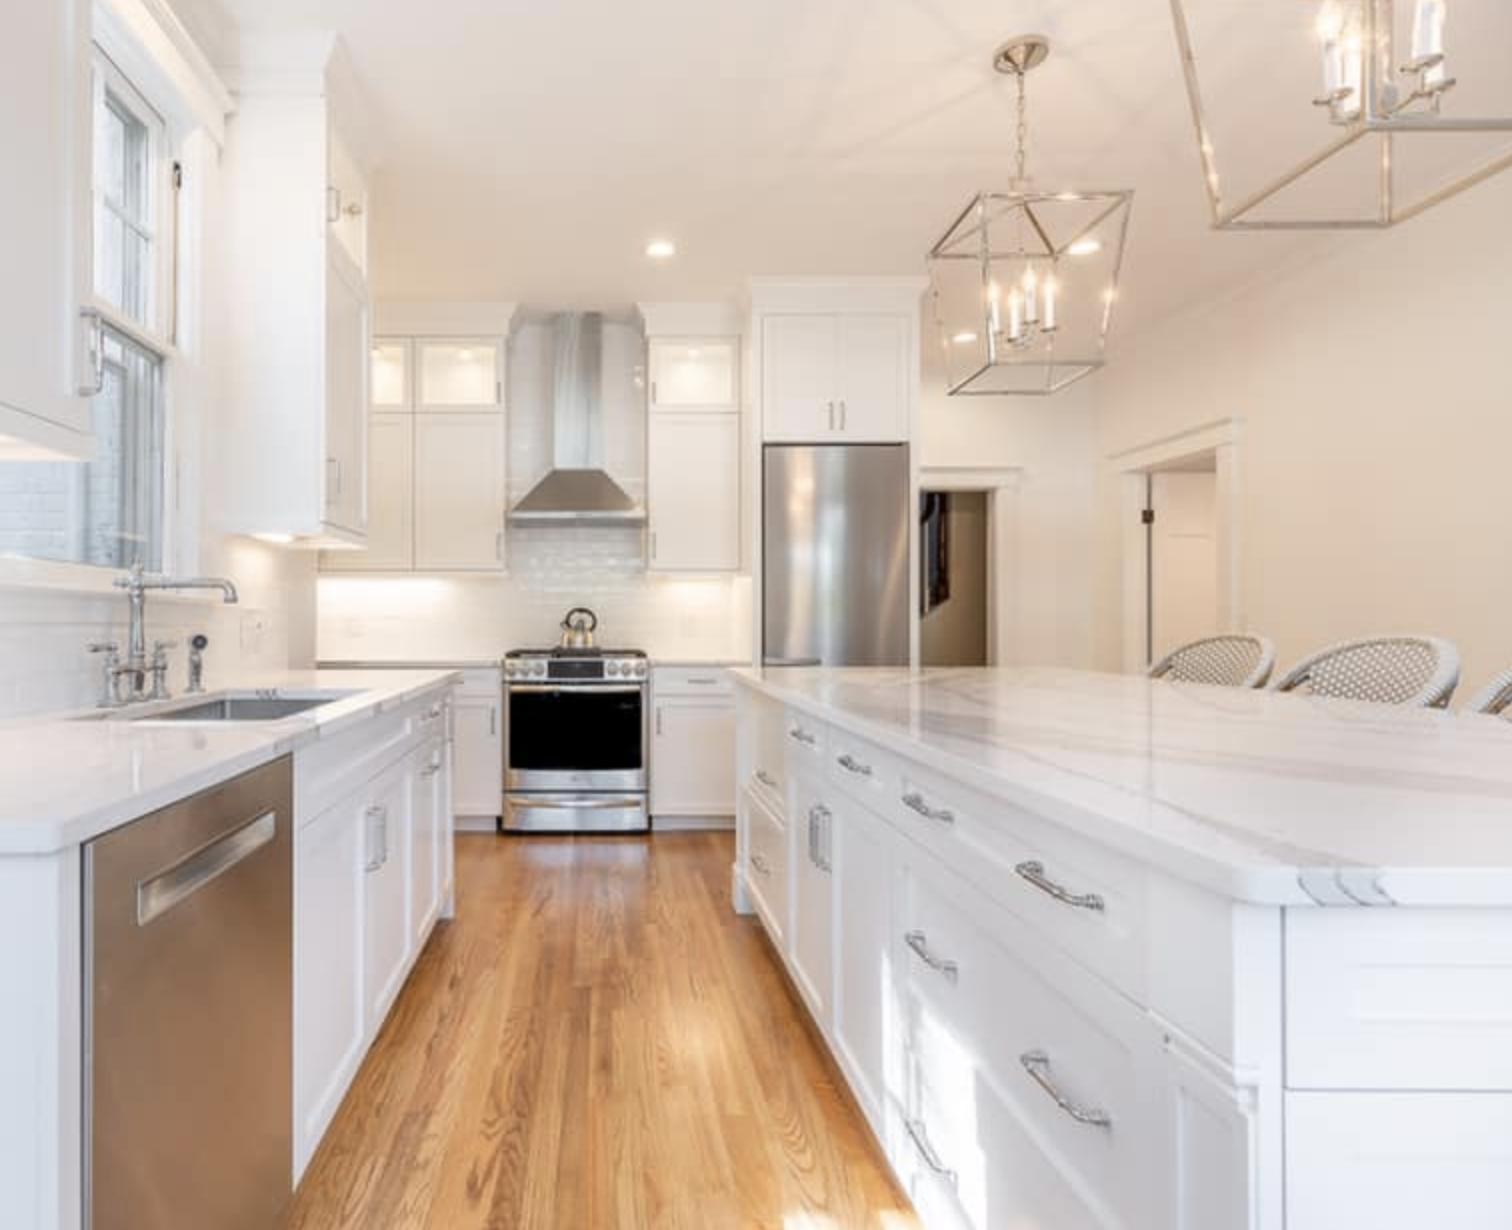 American Craftsman Renovations Best Kitchen Renovations Savannah GA 912-481-8353